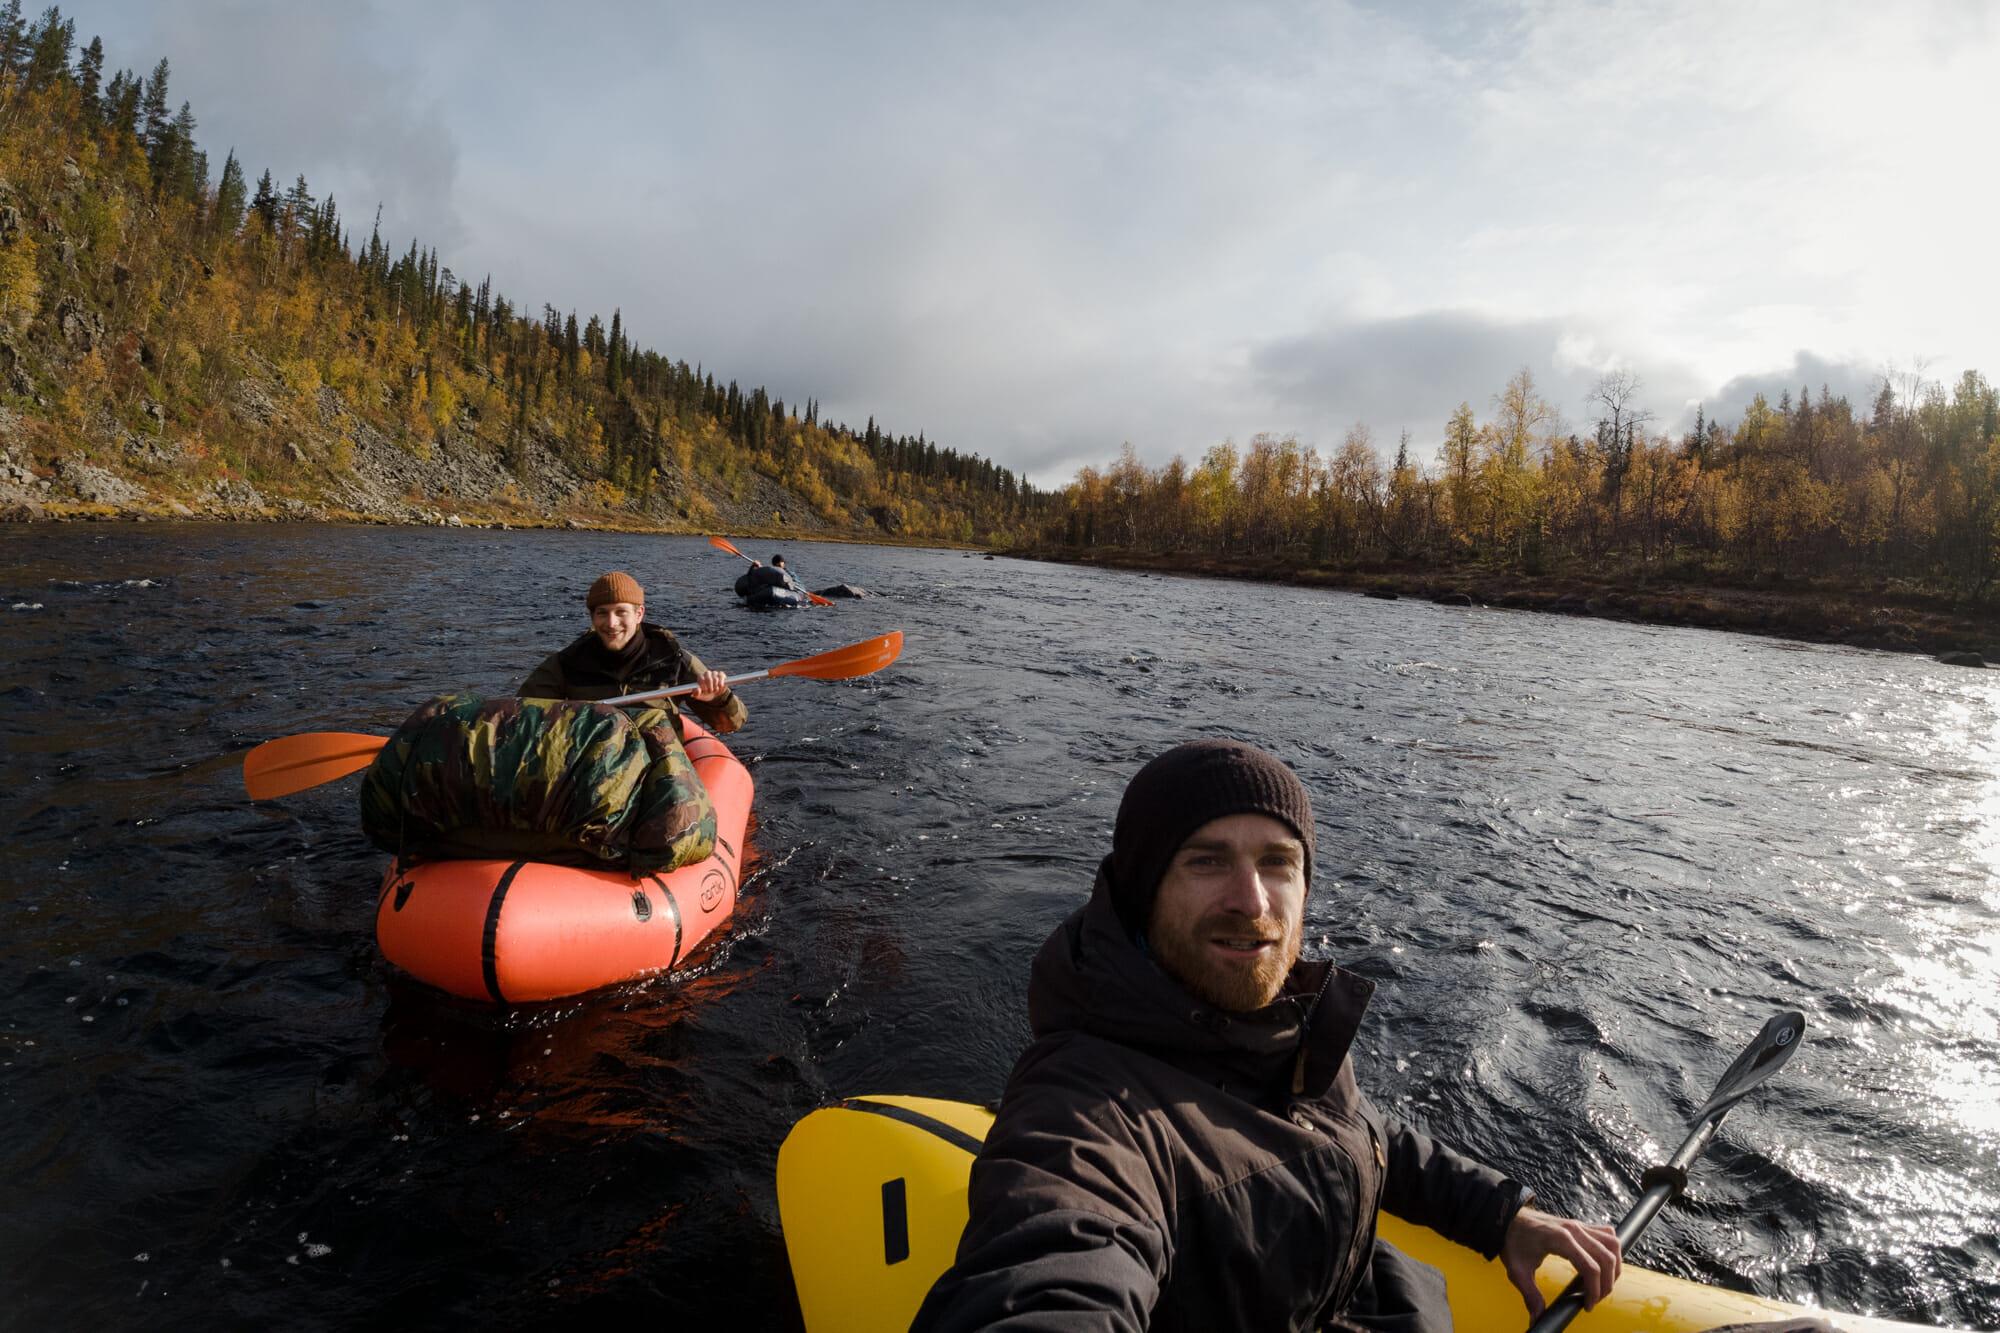 Ivalojoki en Packraft, Laponie finlandaise, Zone sauvage d'Hammastunturi